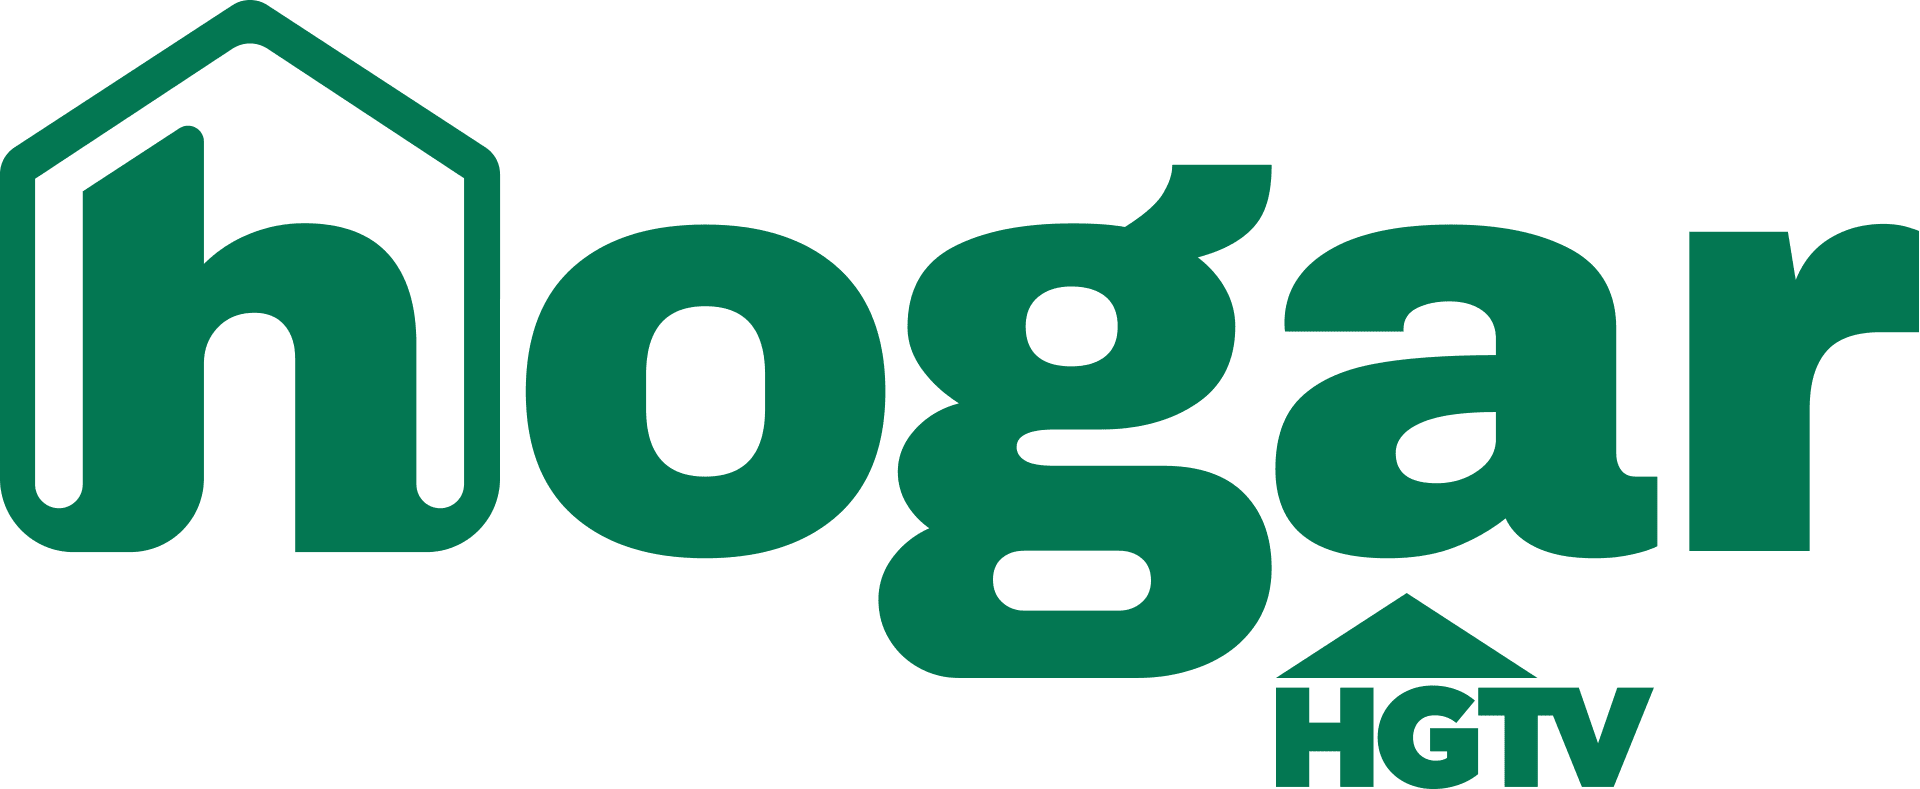 Hogar de HGTV